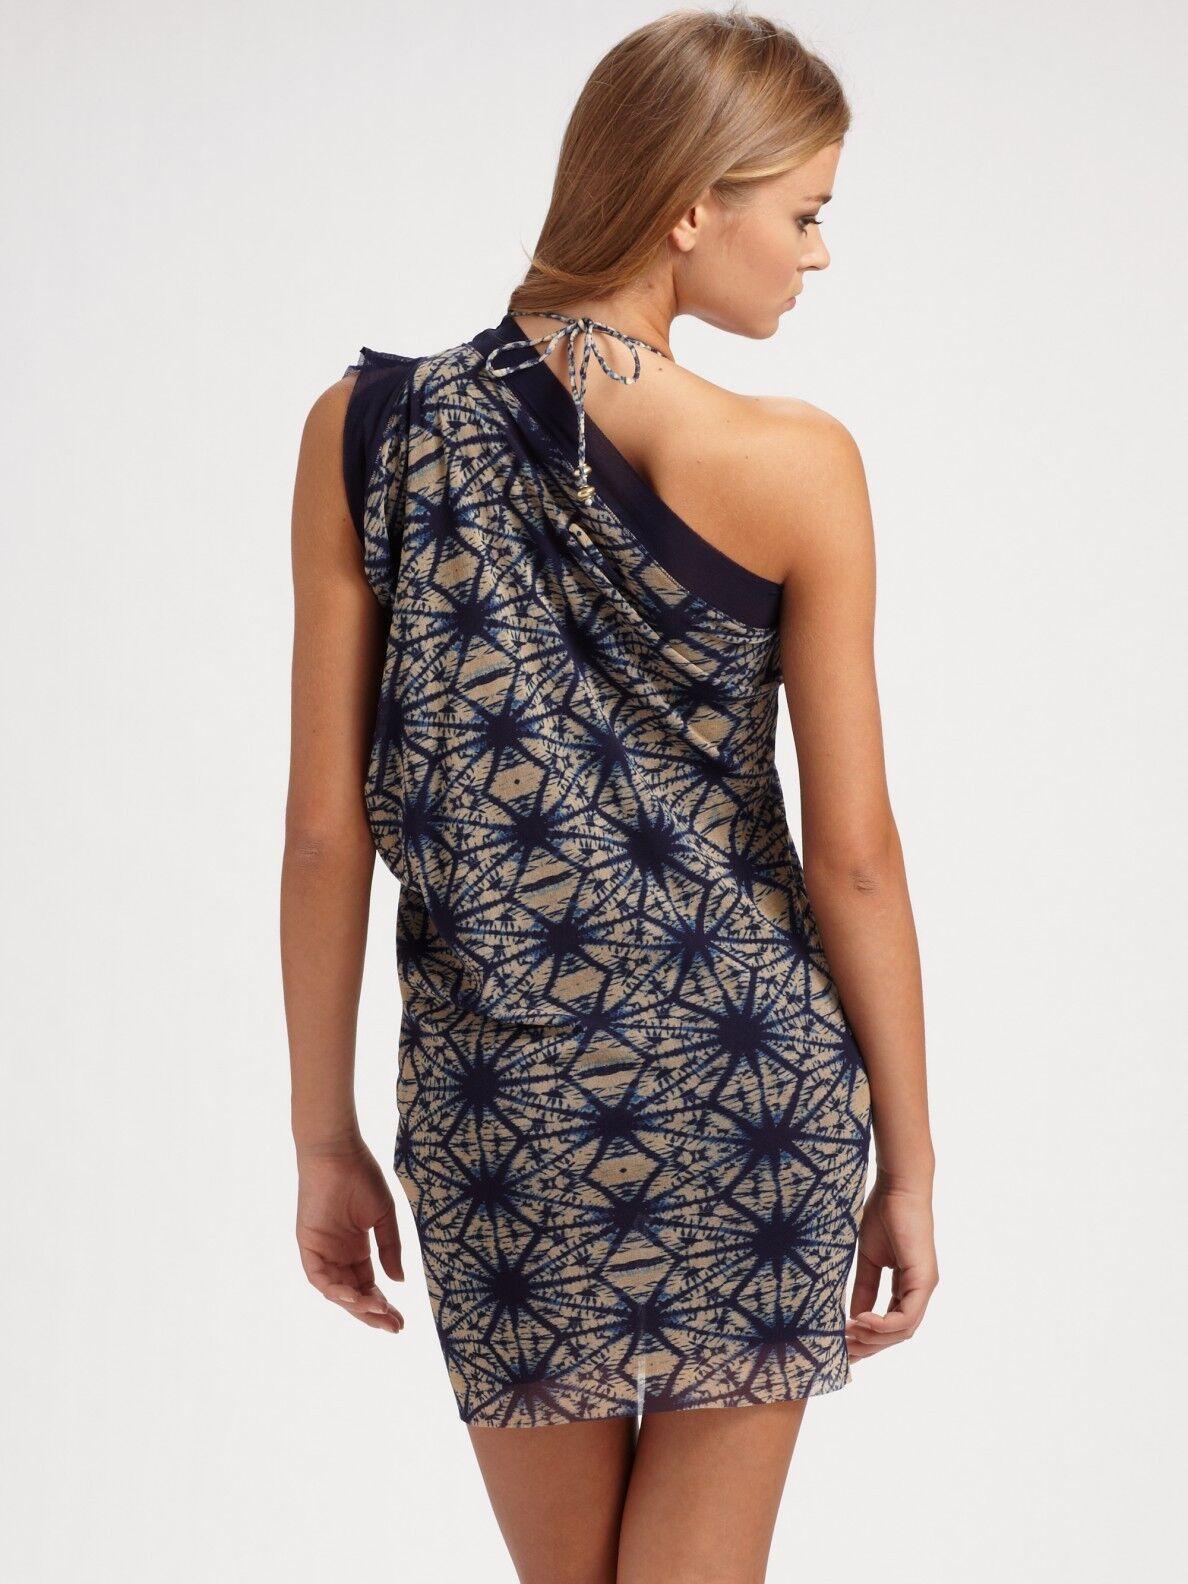 Jean Paul Gaultier Fuzzi JPG Soleil Beach Swim Coverup Mini Dress  795 82% off